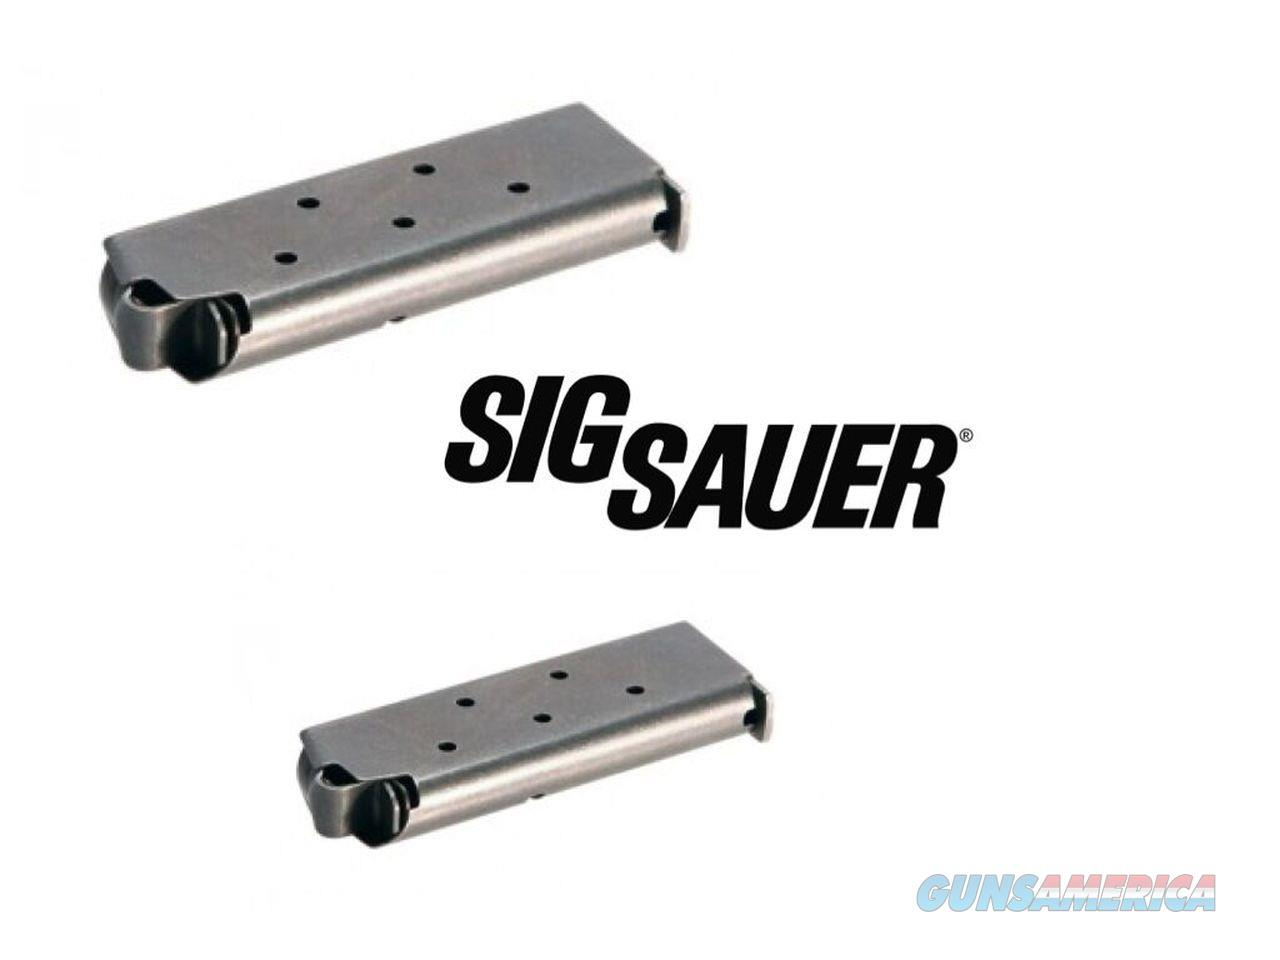 2-Pack Sig p238 P 238 380 .380 6 Round SIG BRAND Mag Magazines Magazine SIG OEM!  Non-Guns > Ammunition